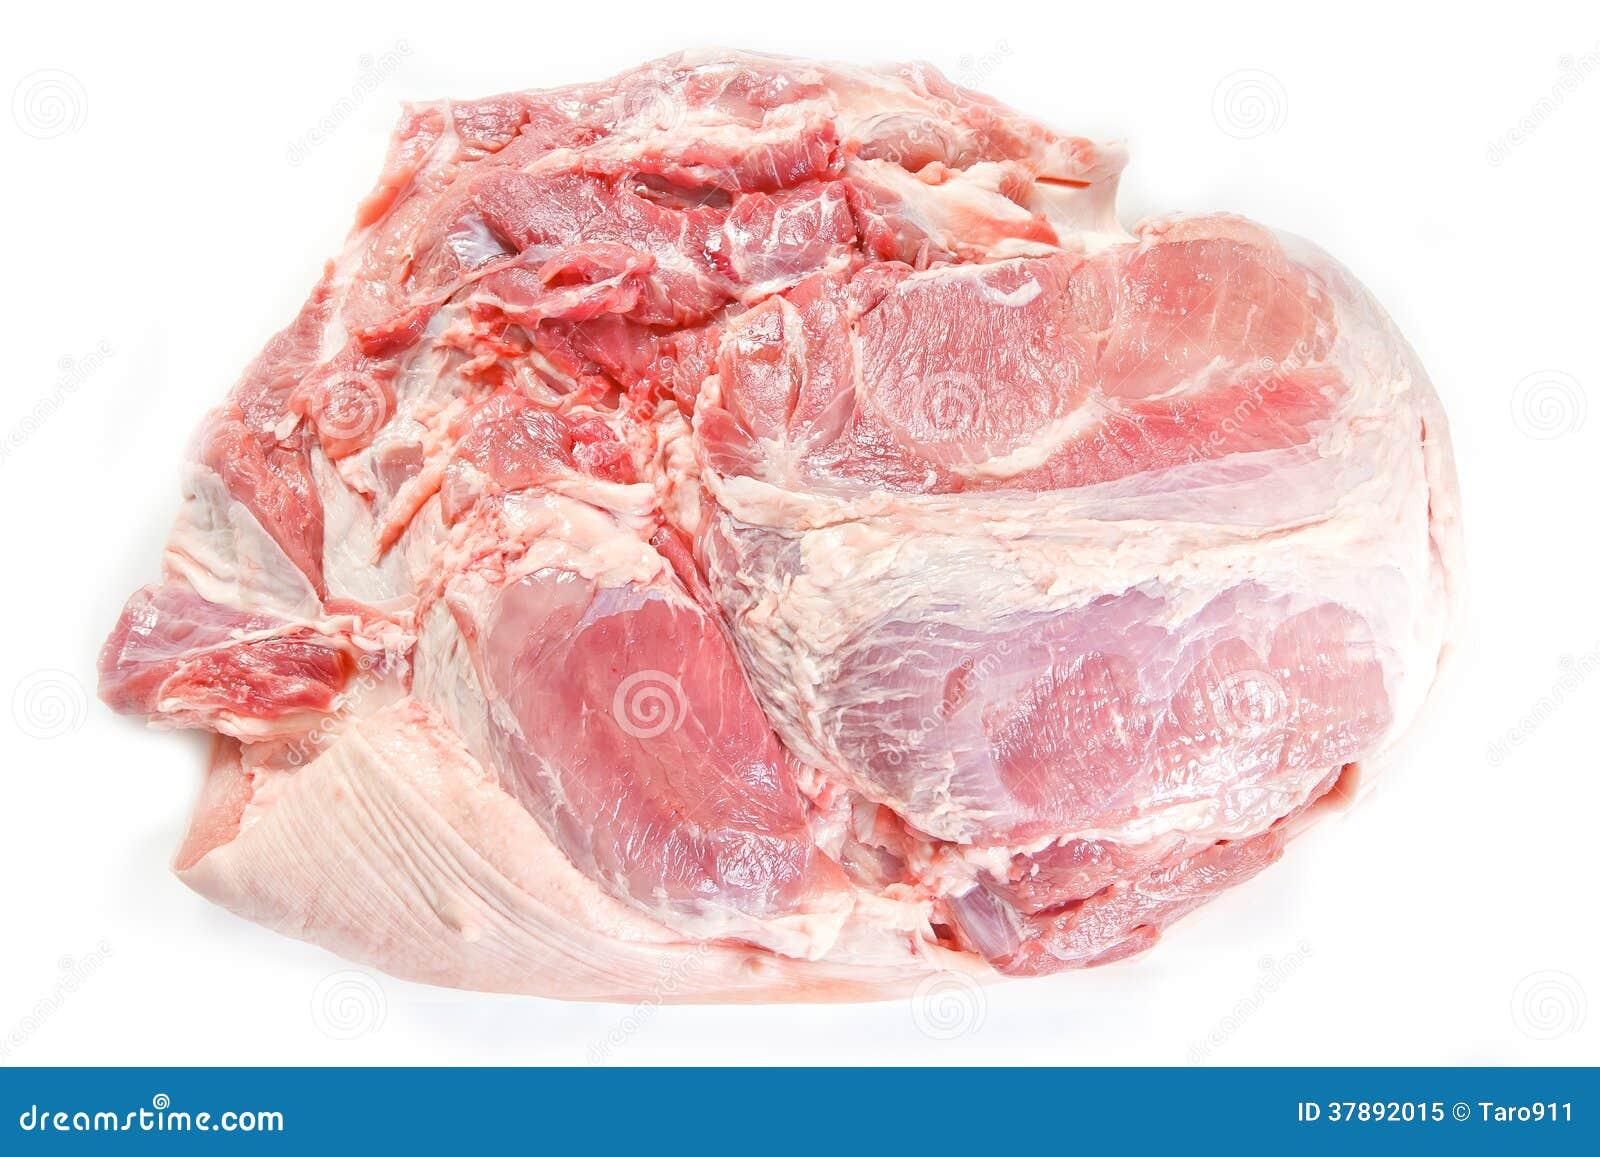 Ruw varkensvleesvlees